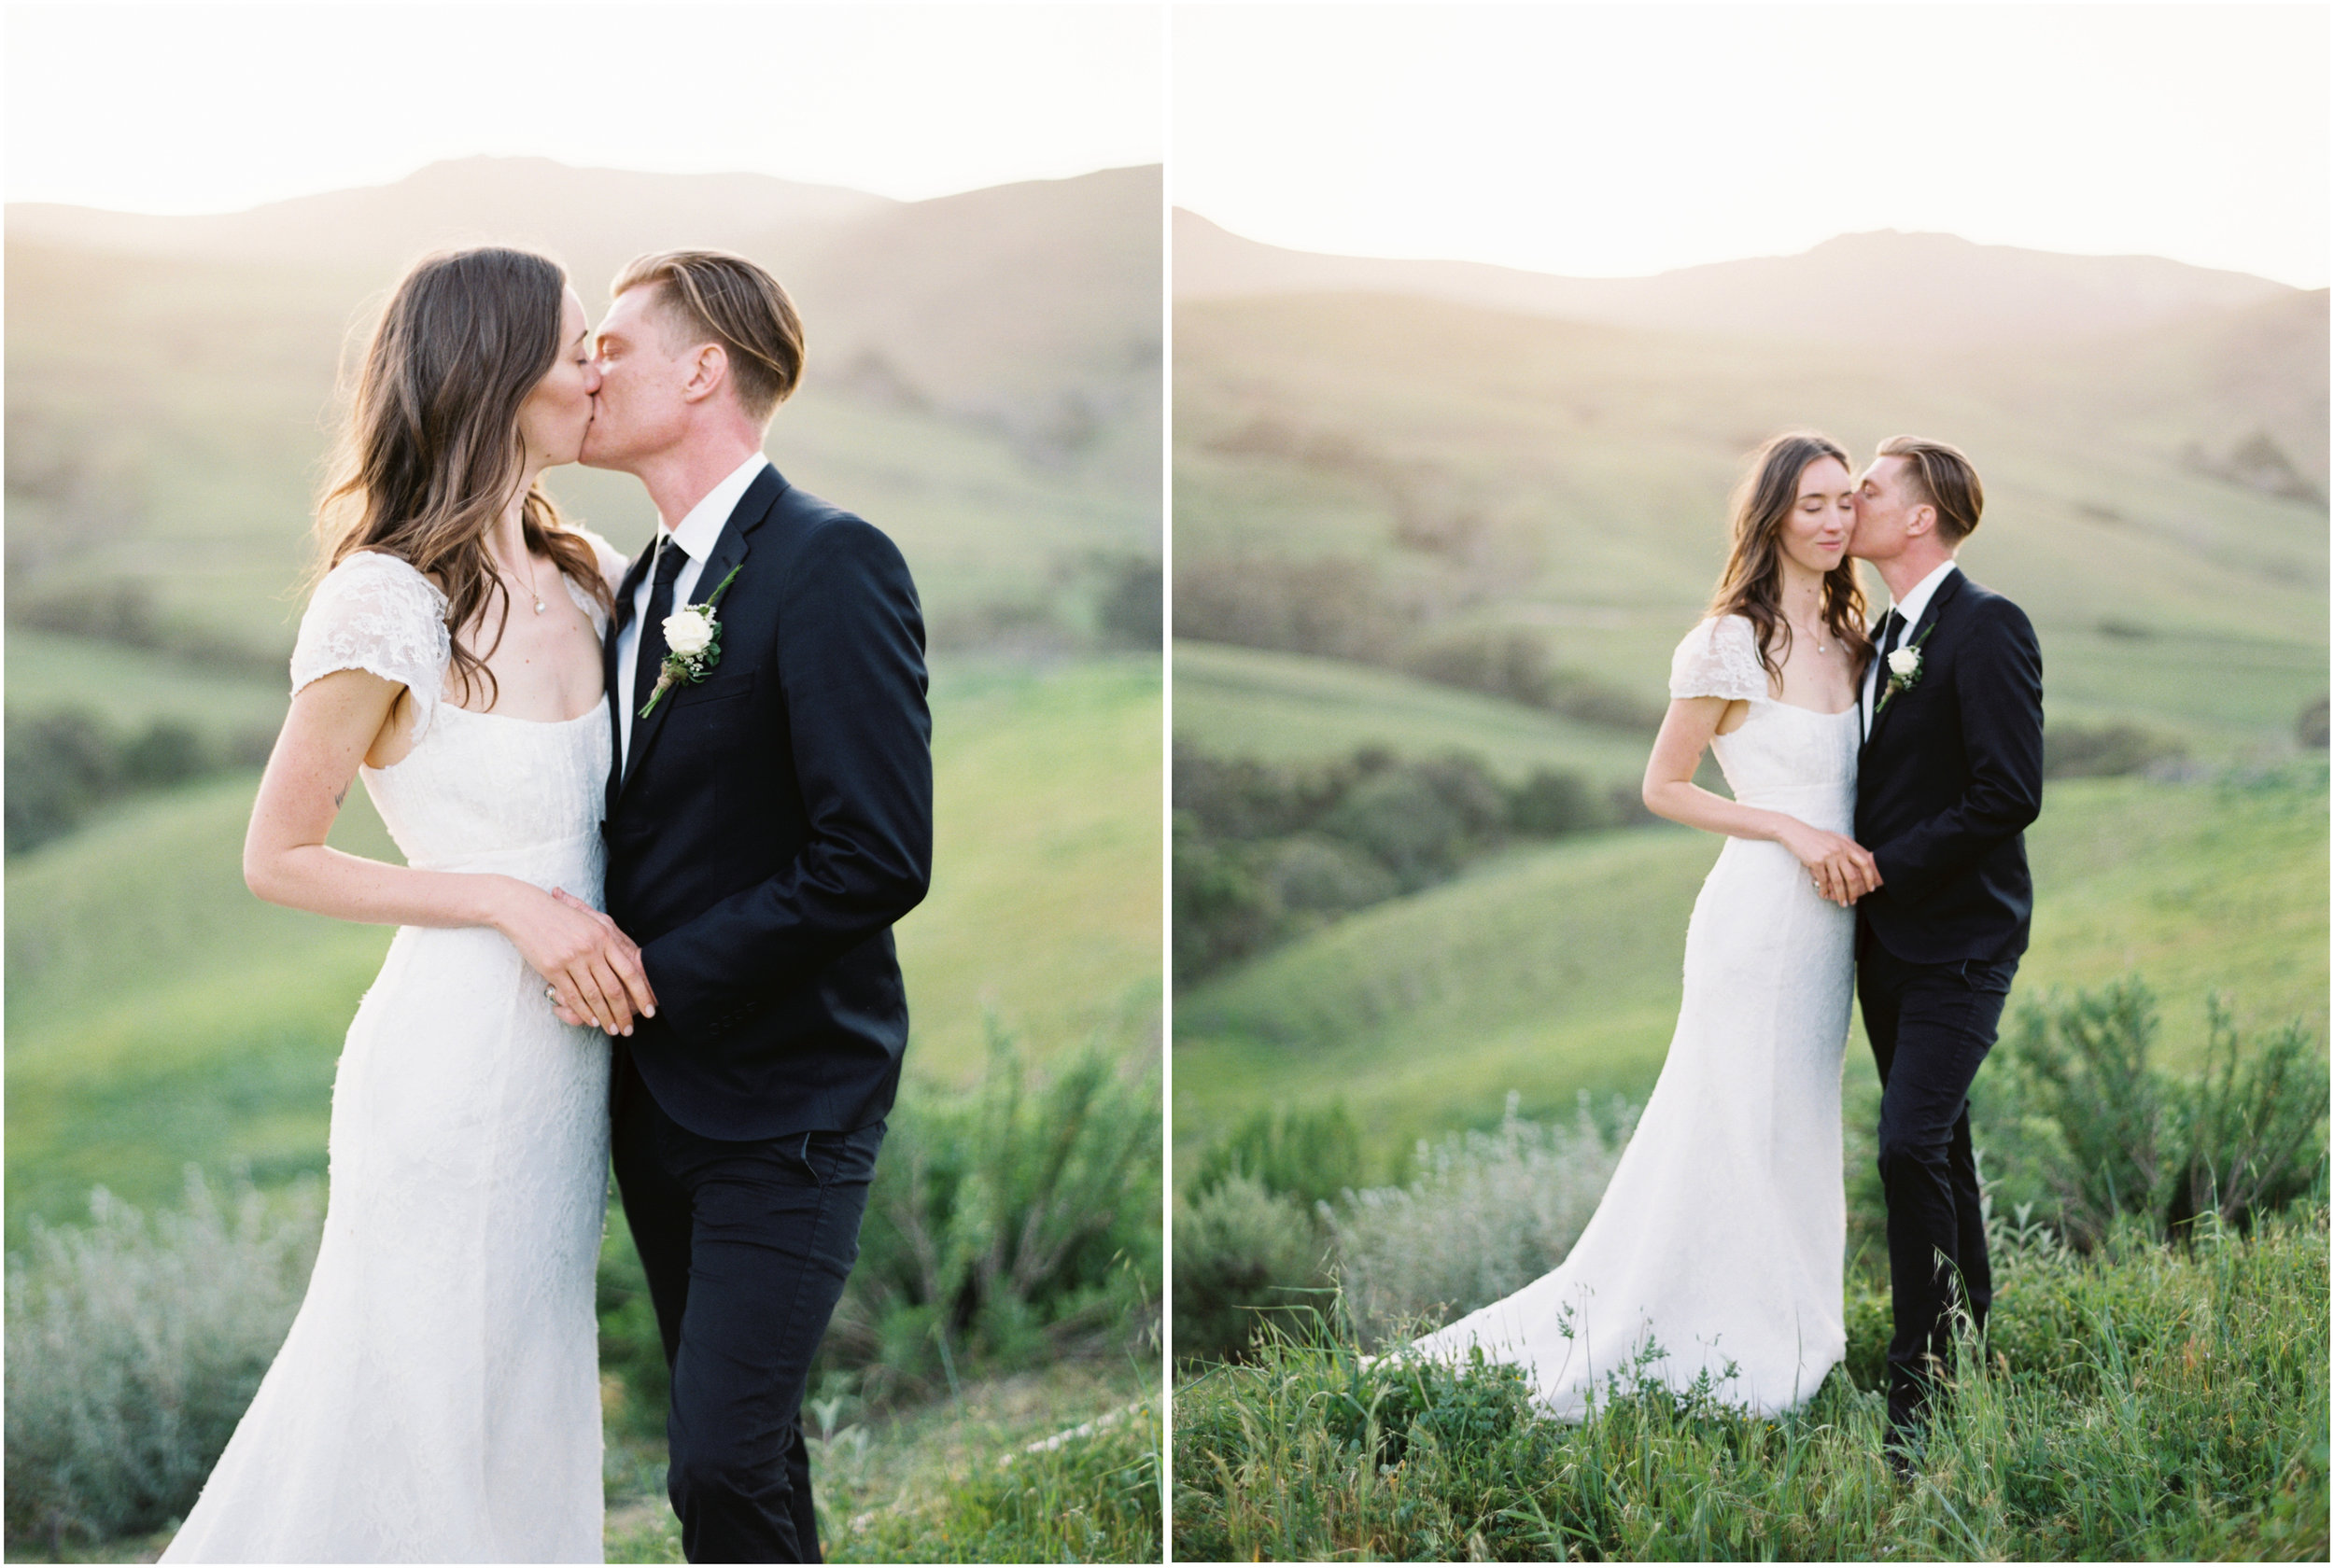 San_Francisco_Wedding_Photographer_Pinnel_Photography_La_Purisima-5.jpg